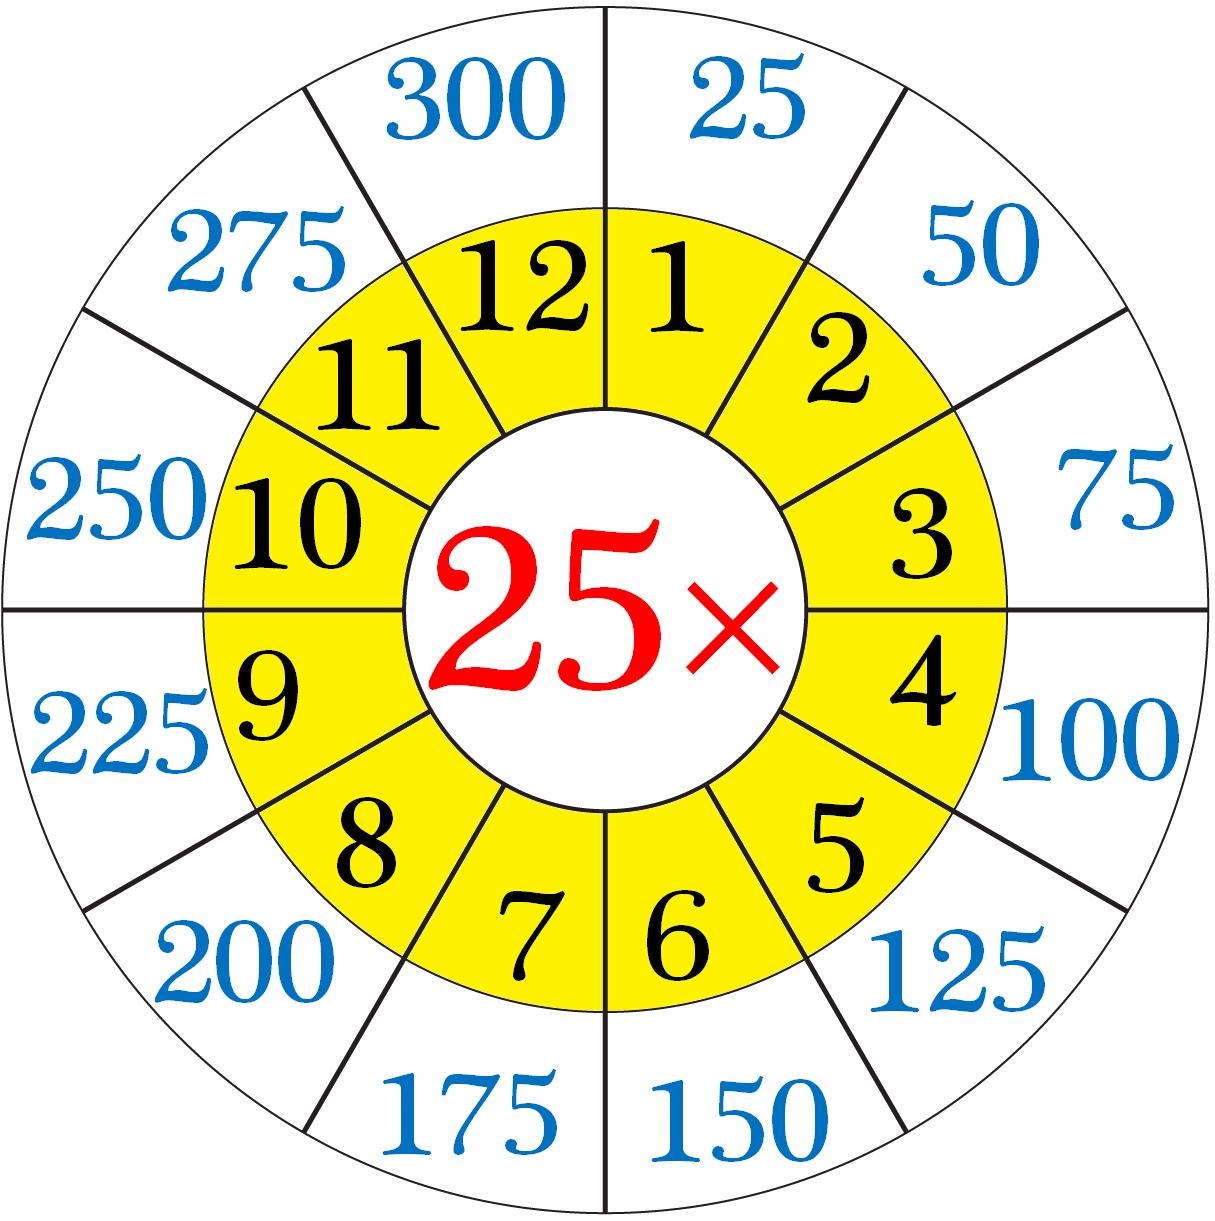 Multiplication Table of Twenty-Five